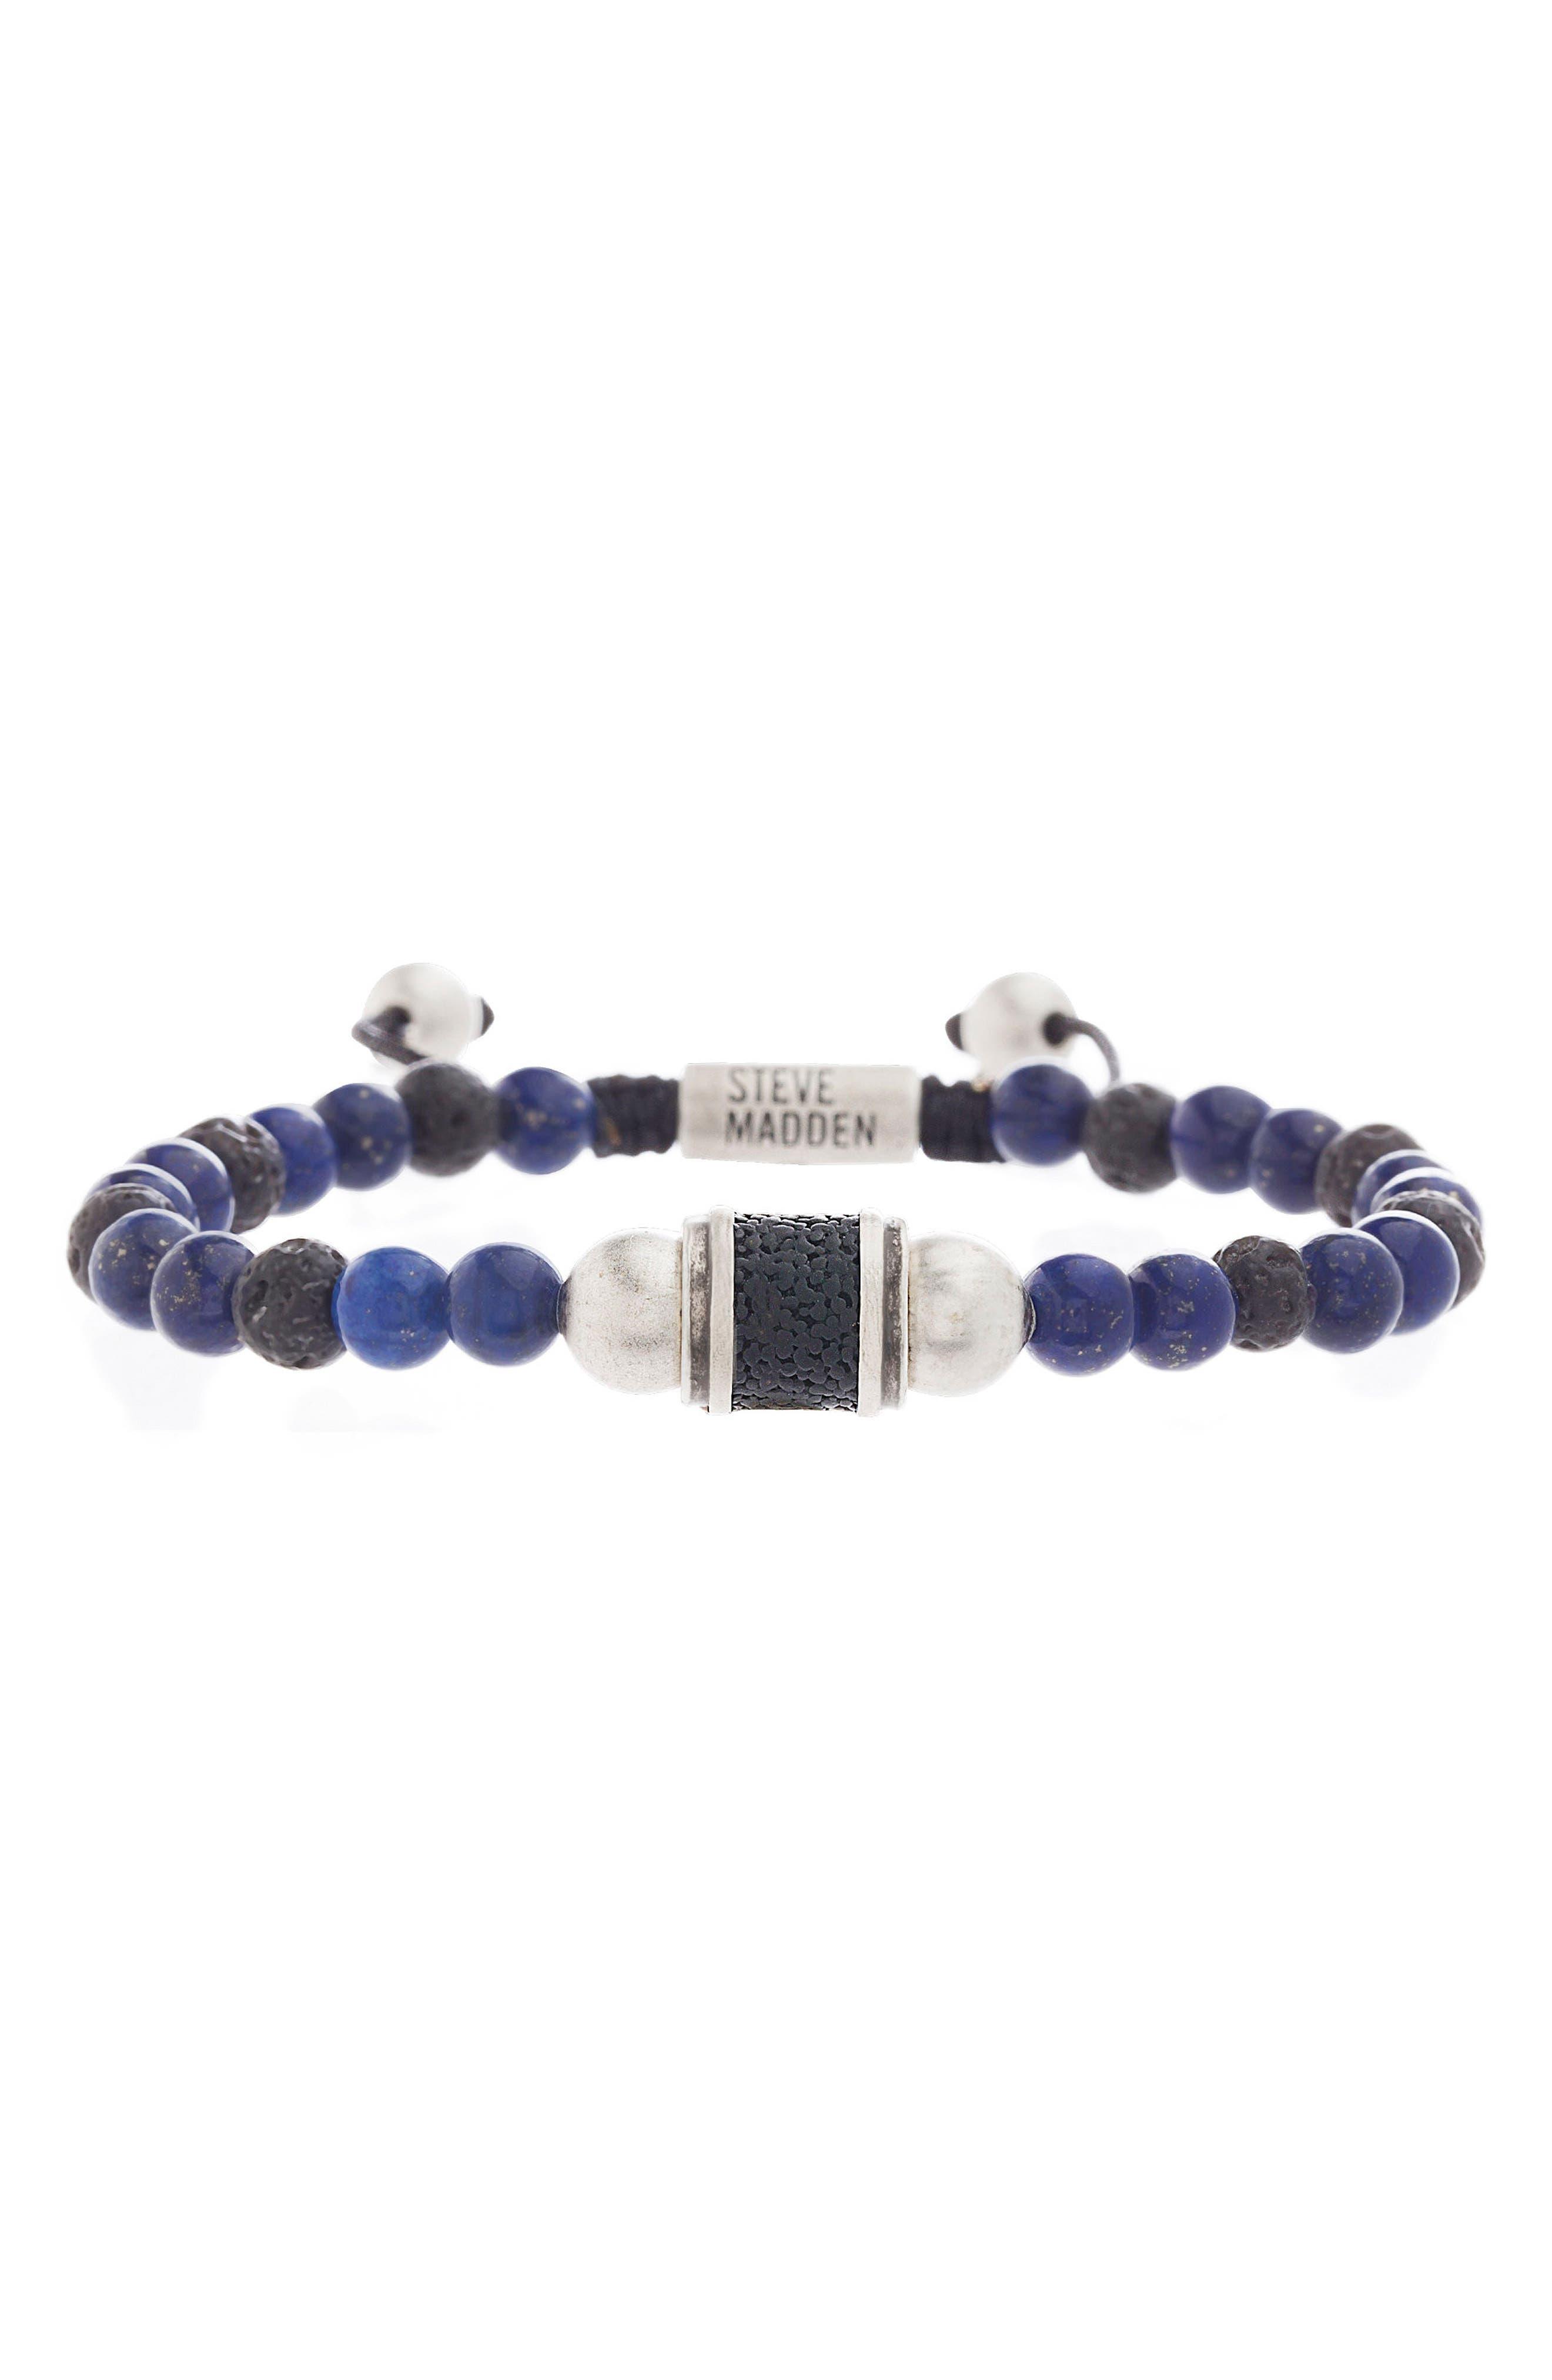 Lapis Lazuli Bead Bracelet,                             Main thumbnail 1, color,                             400